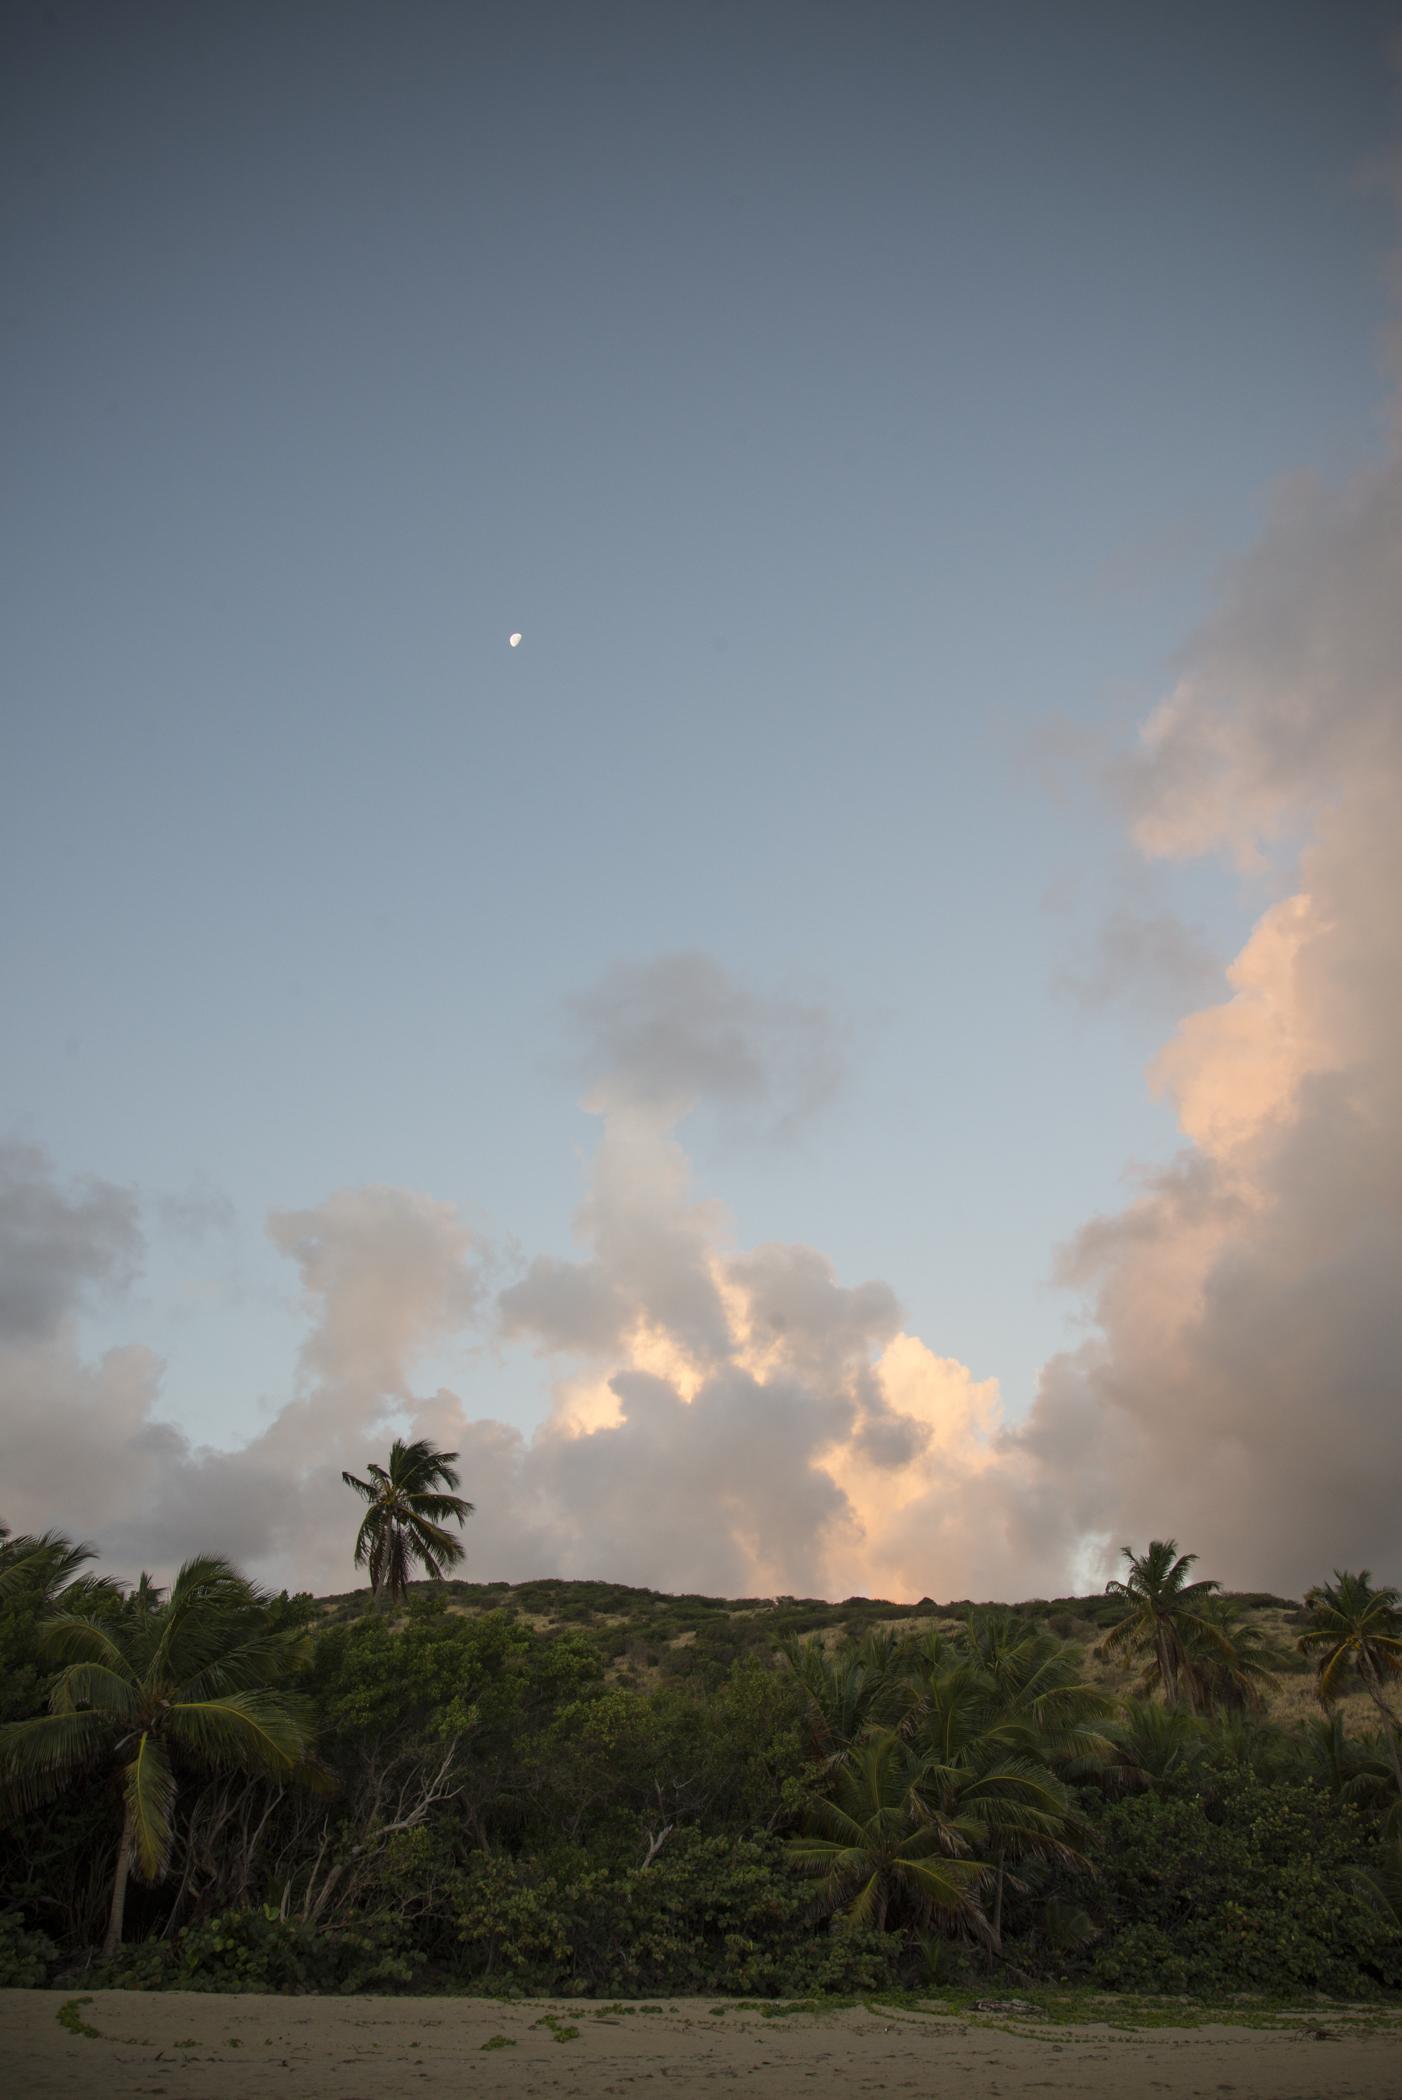 012014-Culebra-JuliaLuckettPhotography-103